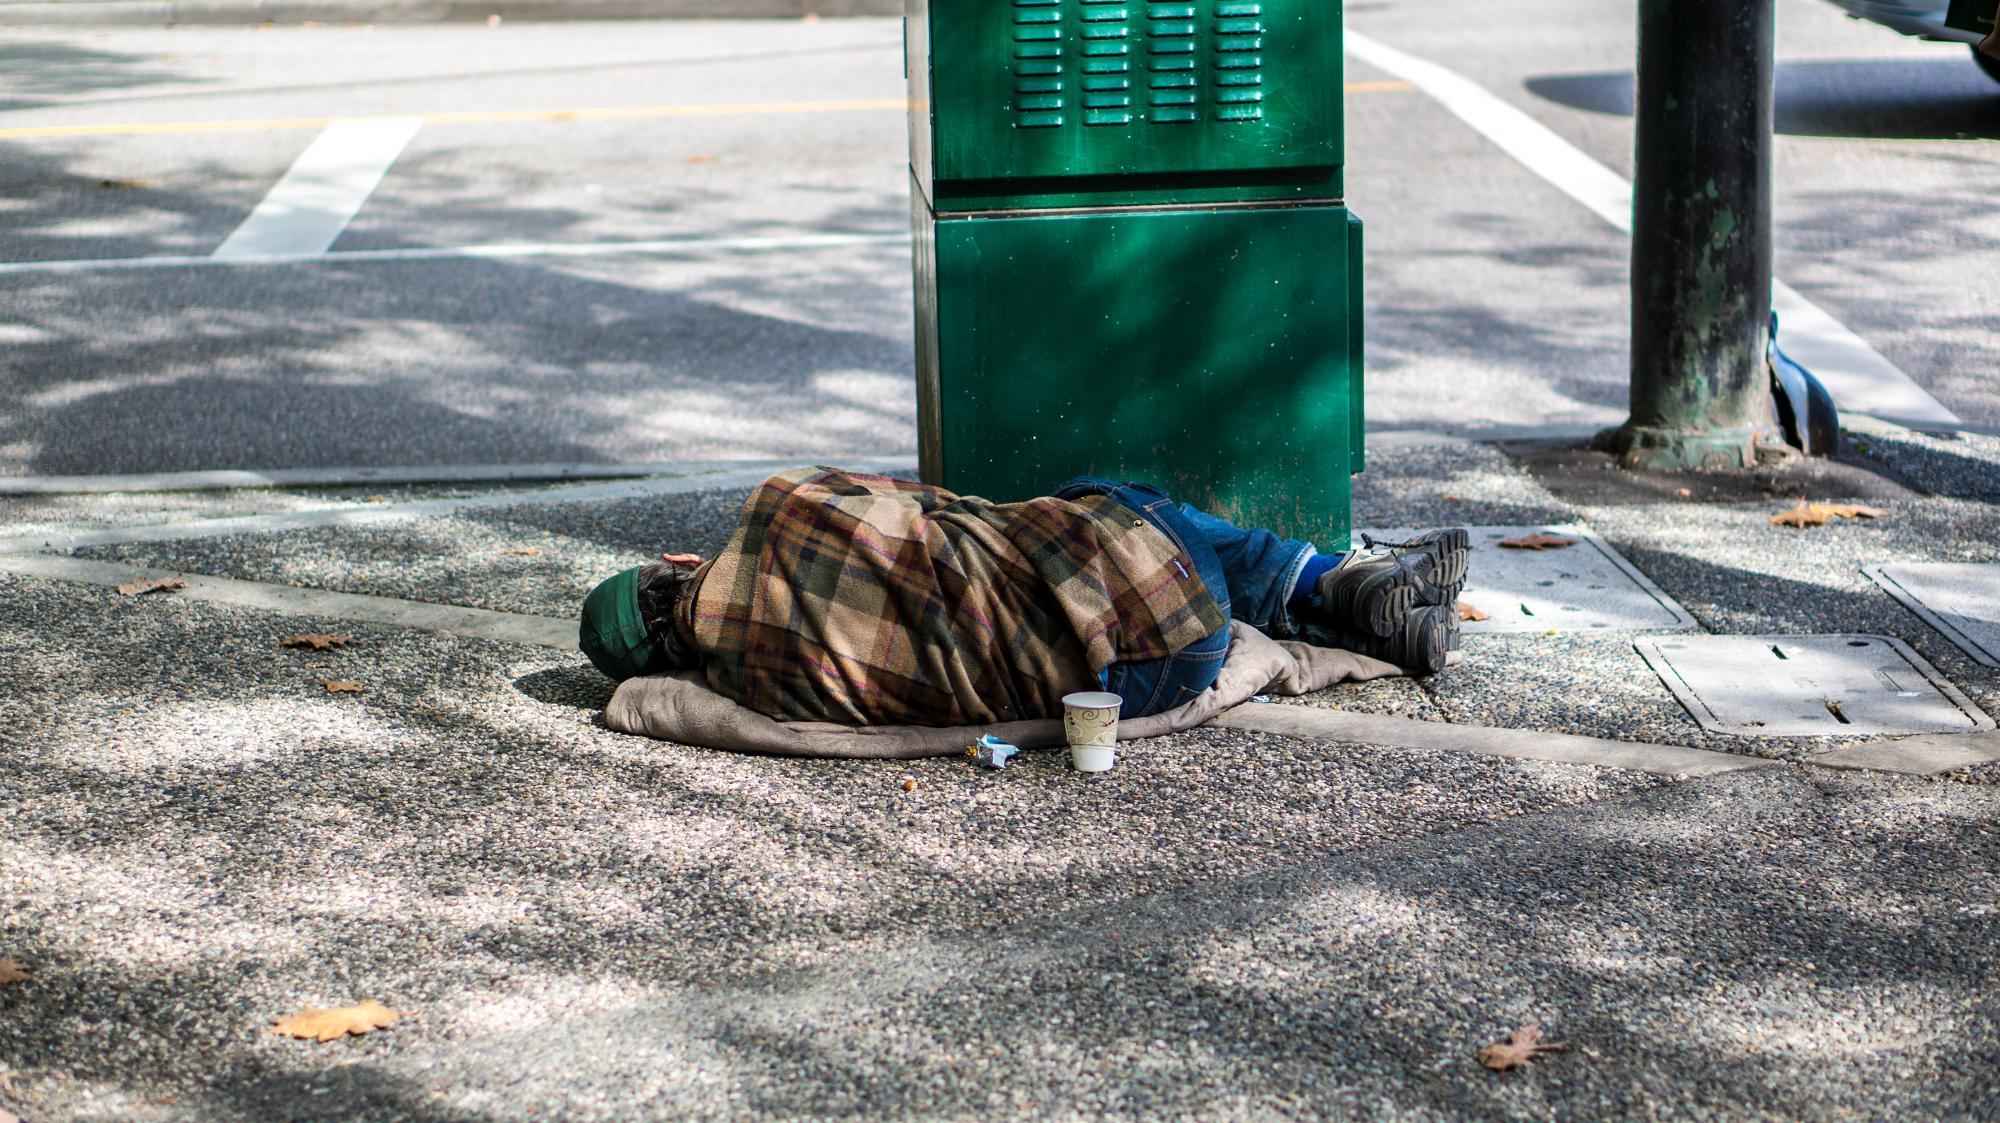 Homelessness in Redlands - ArcGIS StoryMaps